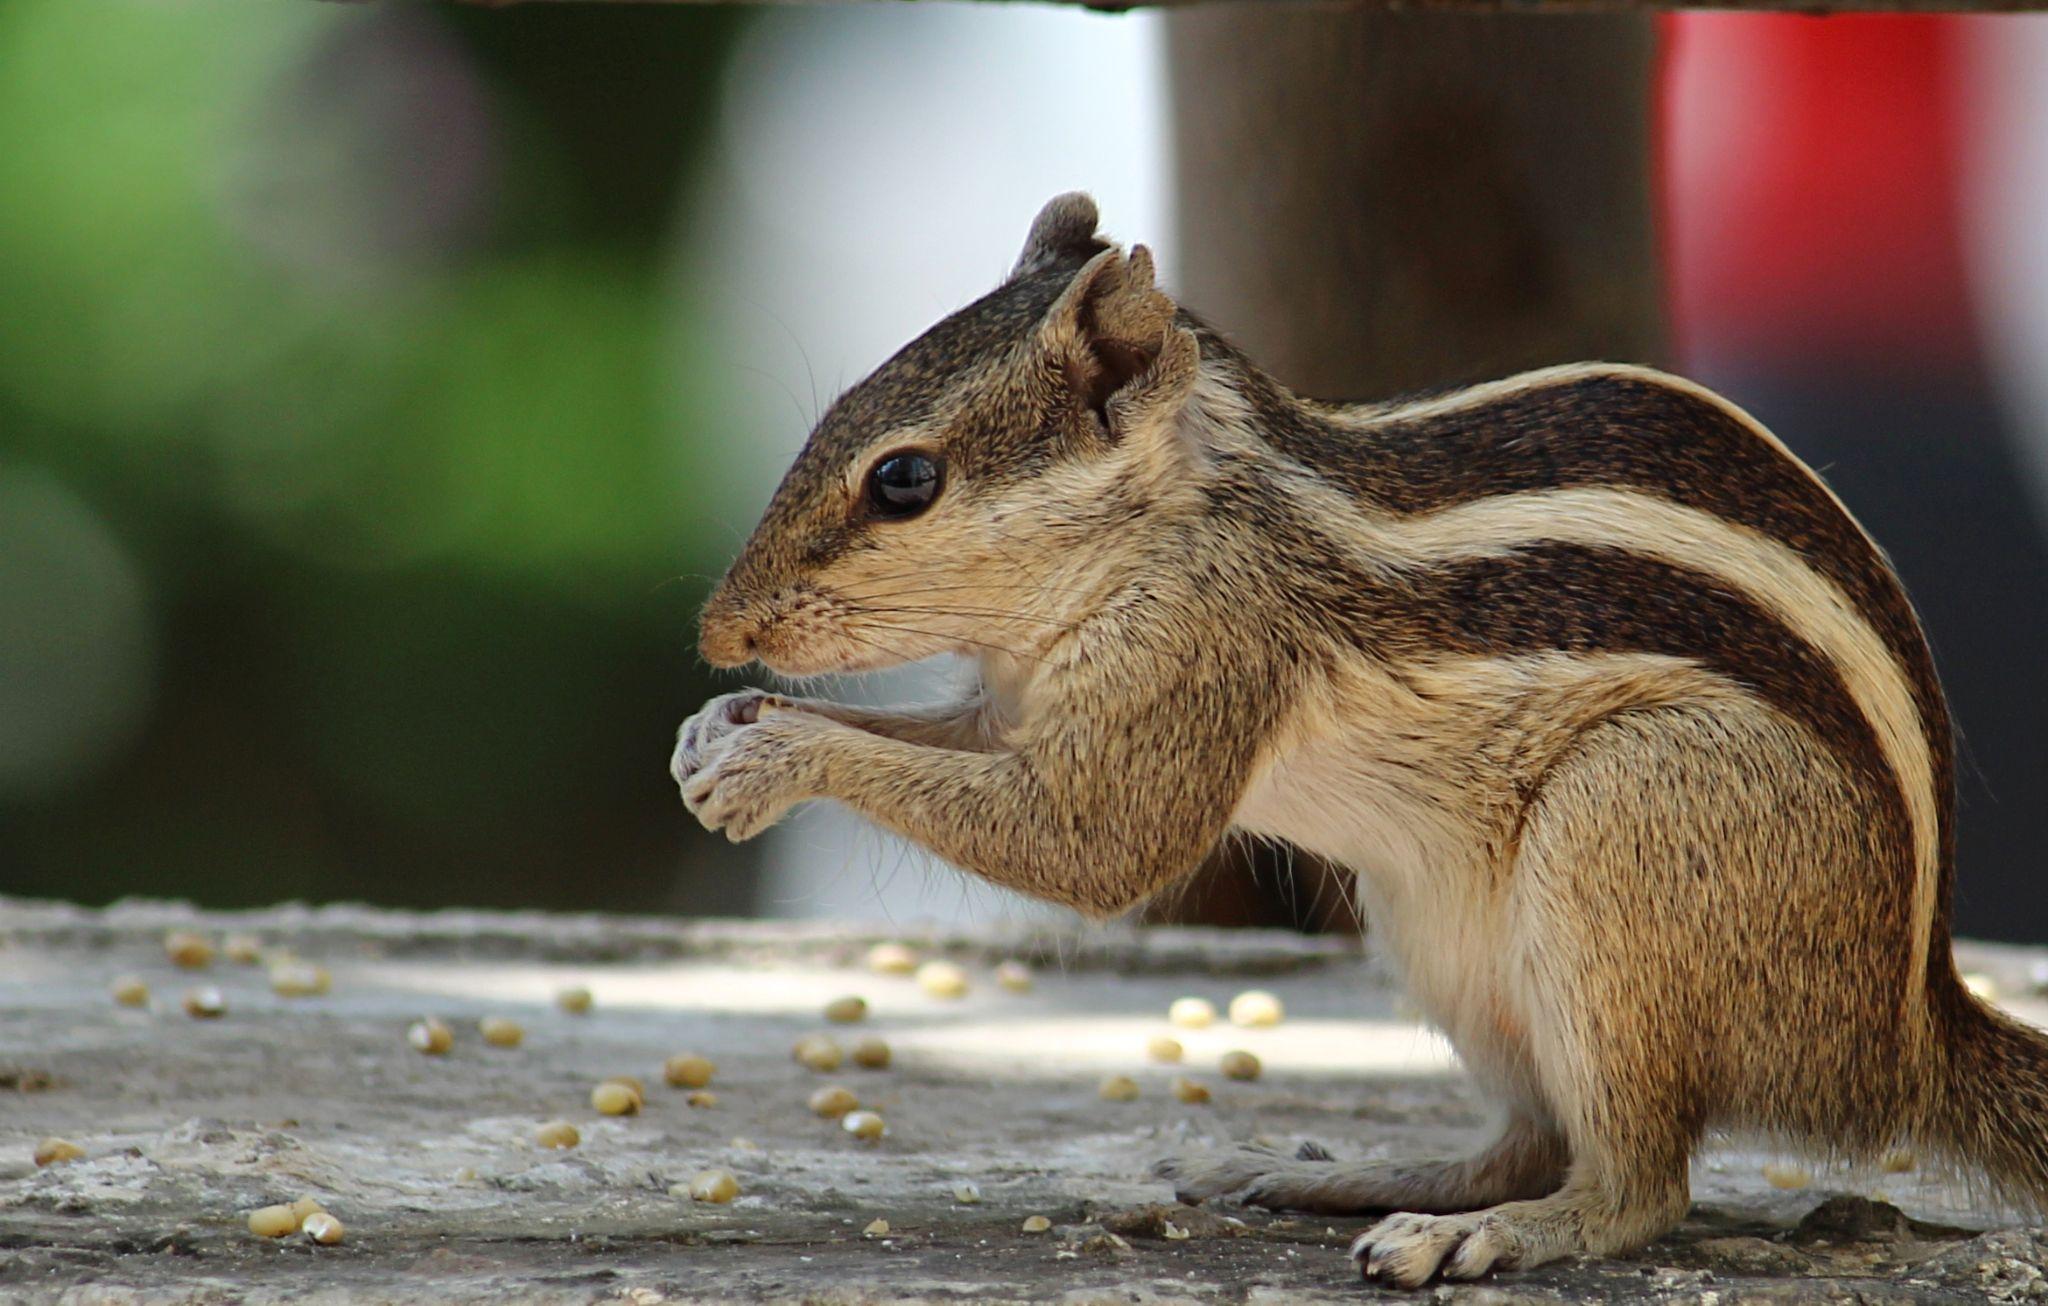 Squirrel by Hemang Shukla